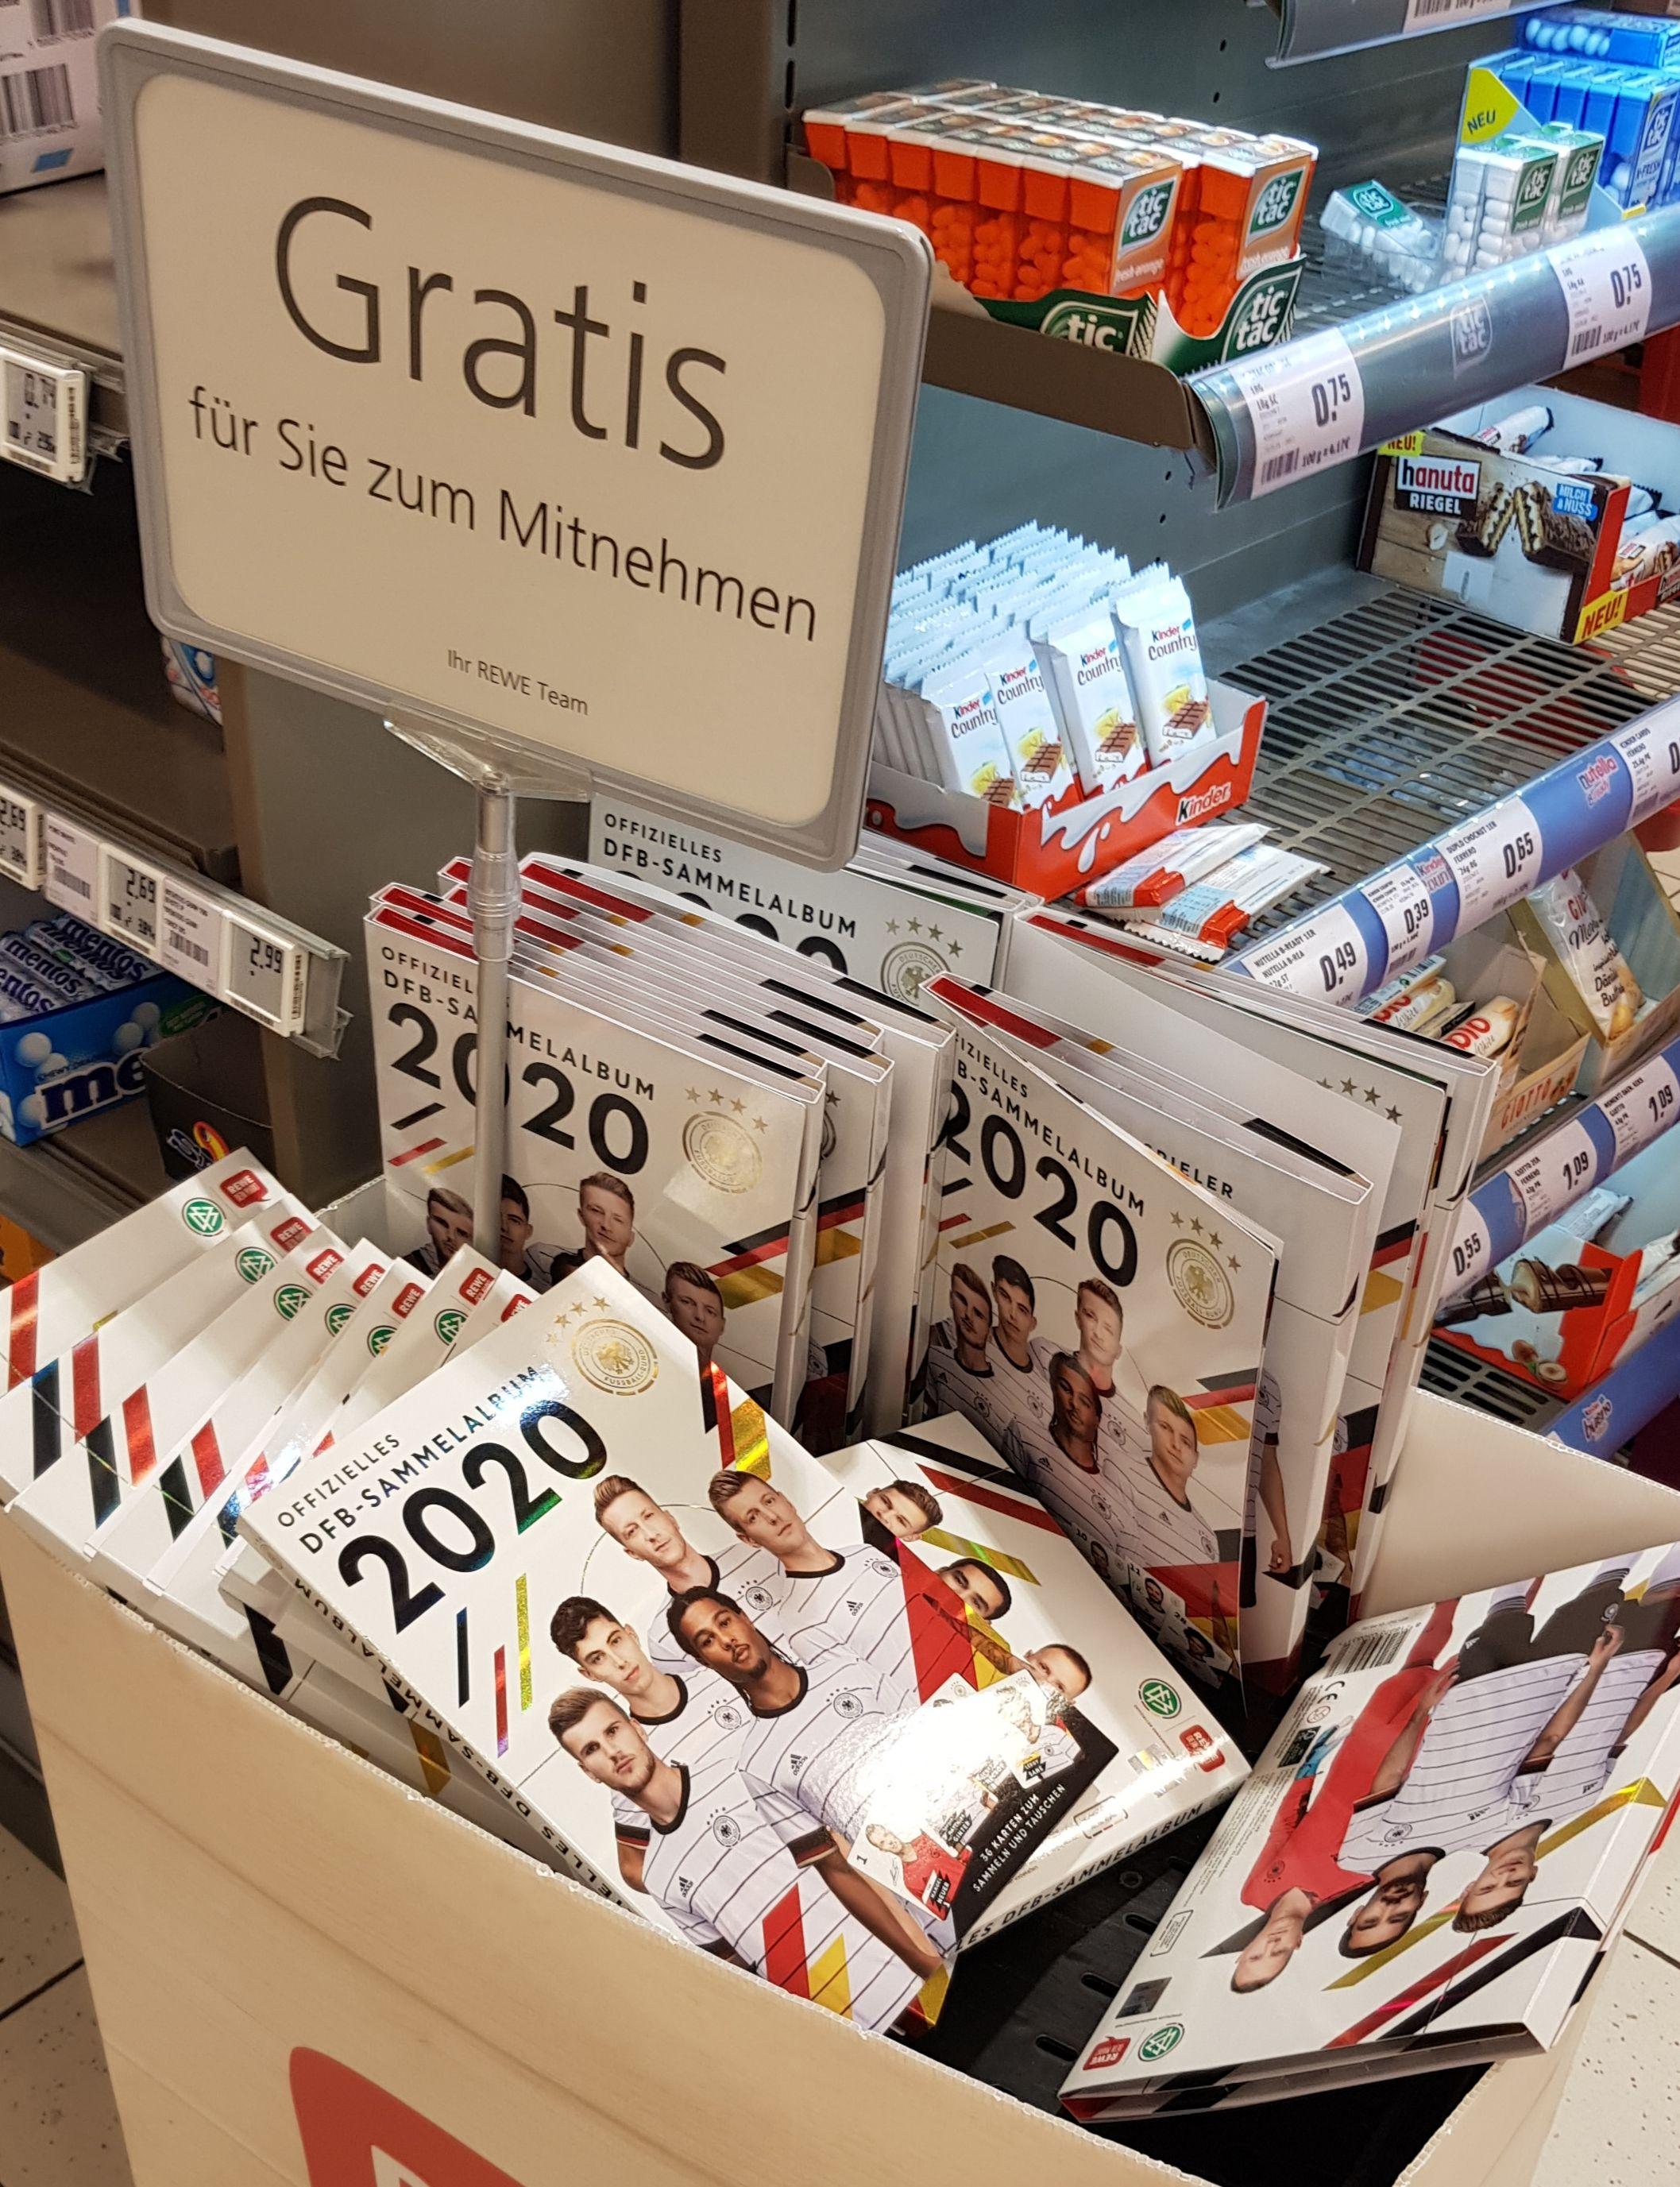 Rewe DFB Fußball Sammelkarten EM 2020 Heft gratis Freebie